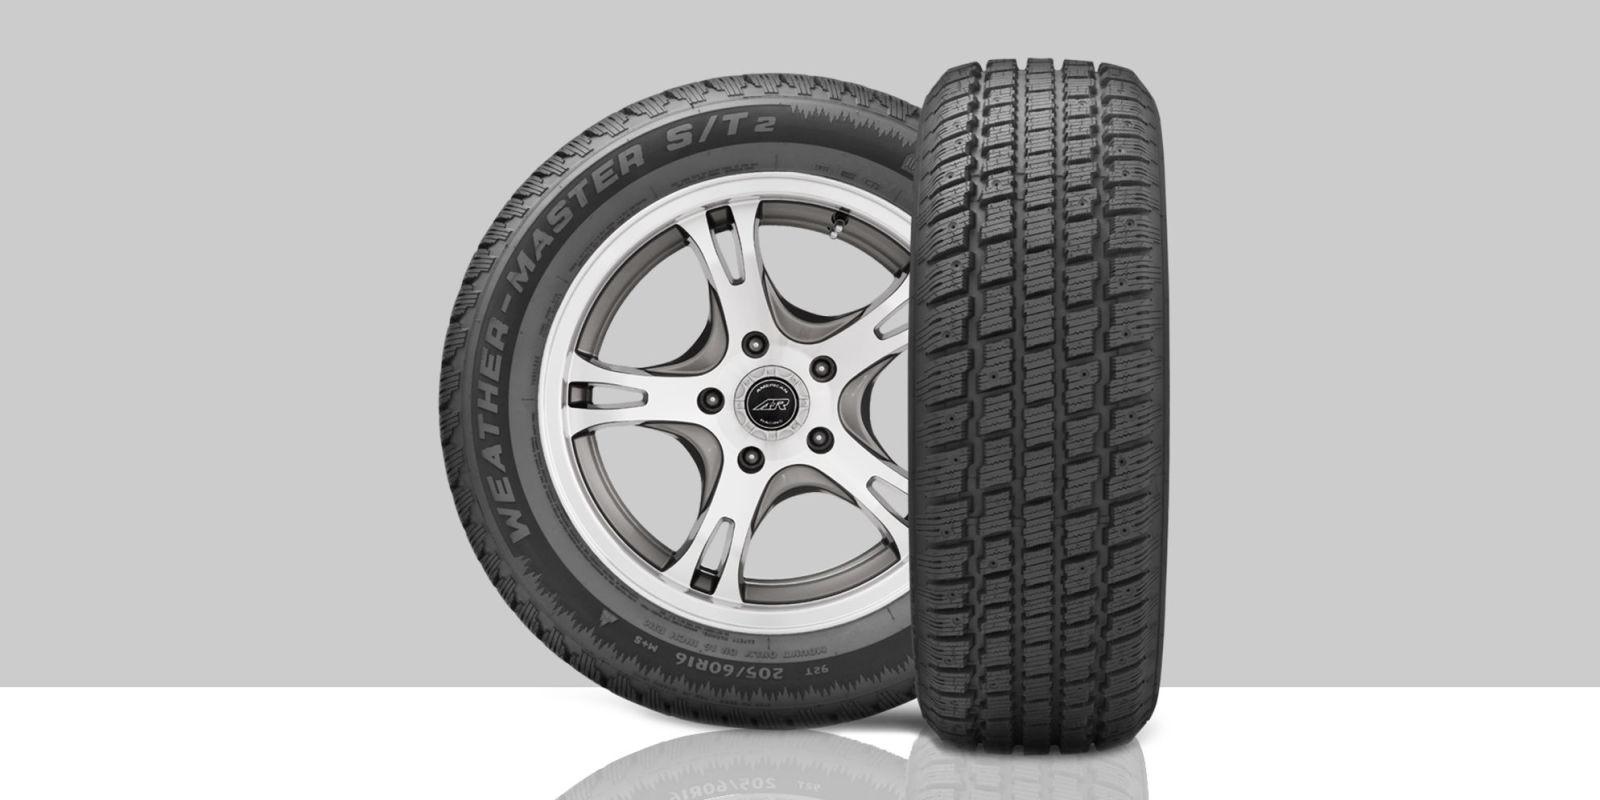 12 best snow tires for winter 2017 durable snow tires under 100. Black Bedroom Furniture Sets. Home Design Ideas